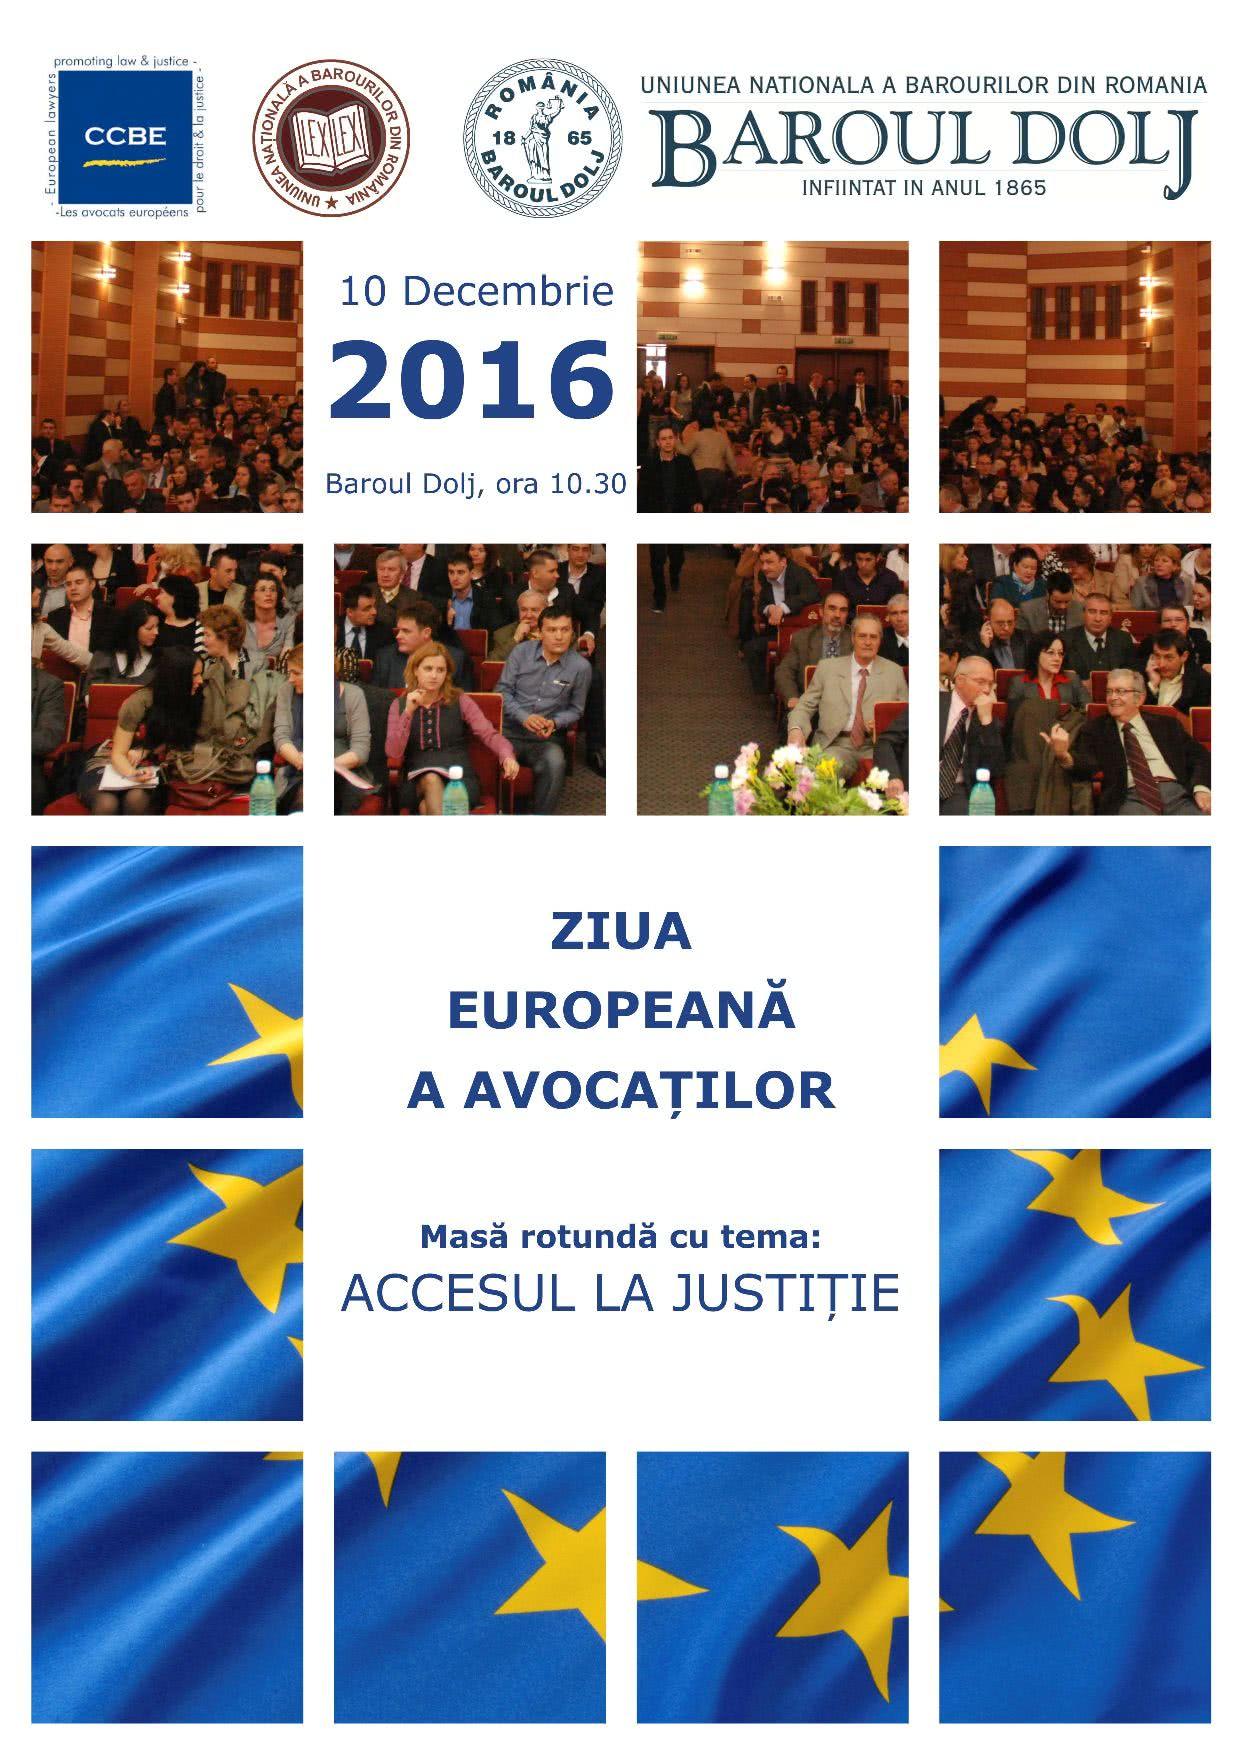 7399_baroul-dolj-ziua-europeana-a-avocatilor-2016-copy